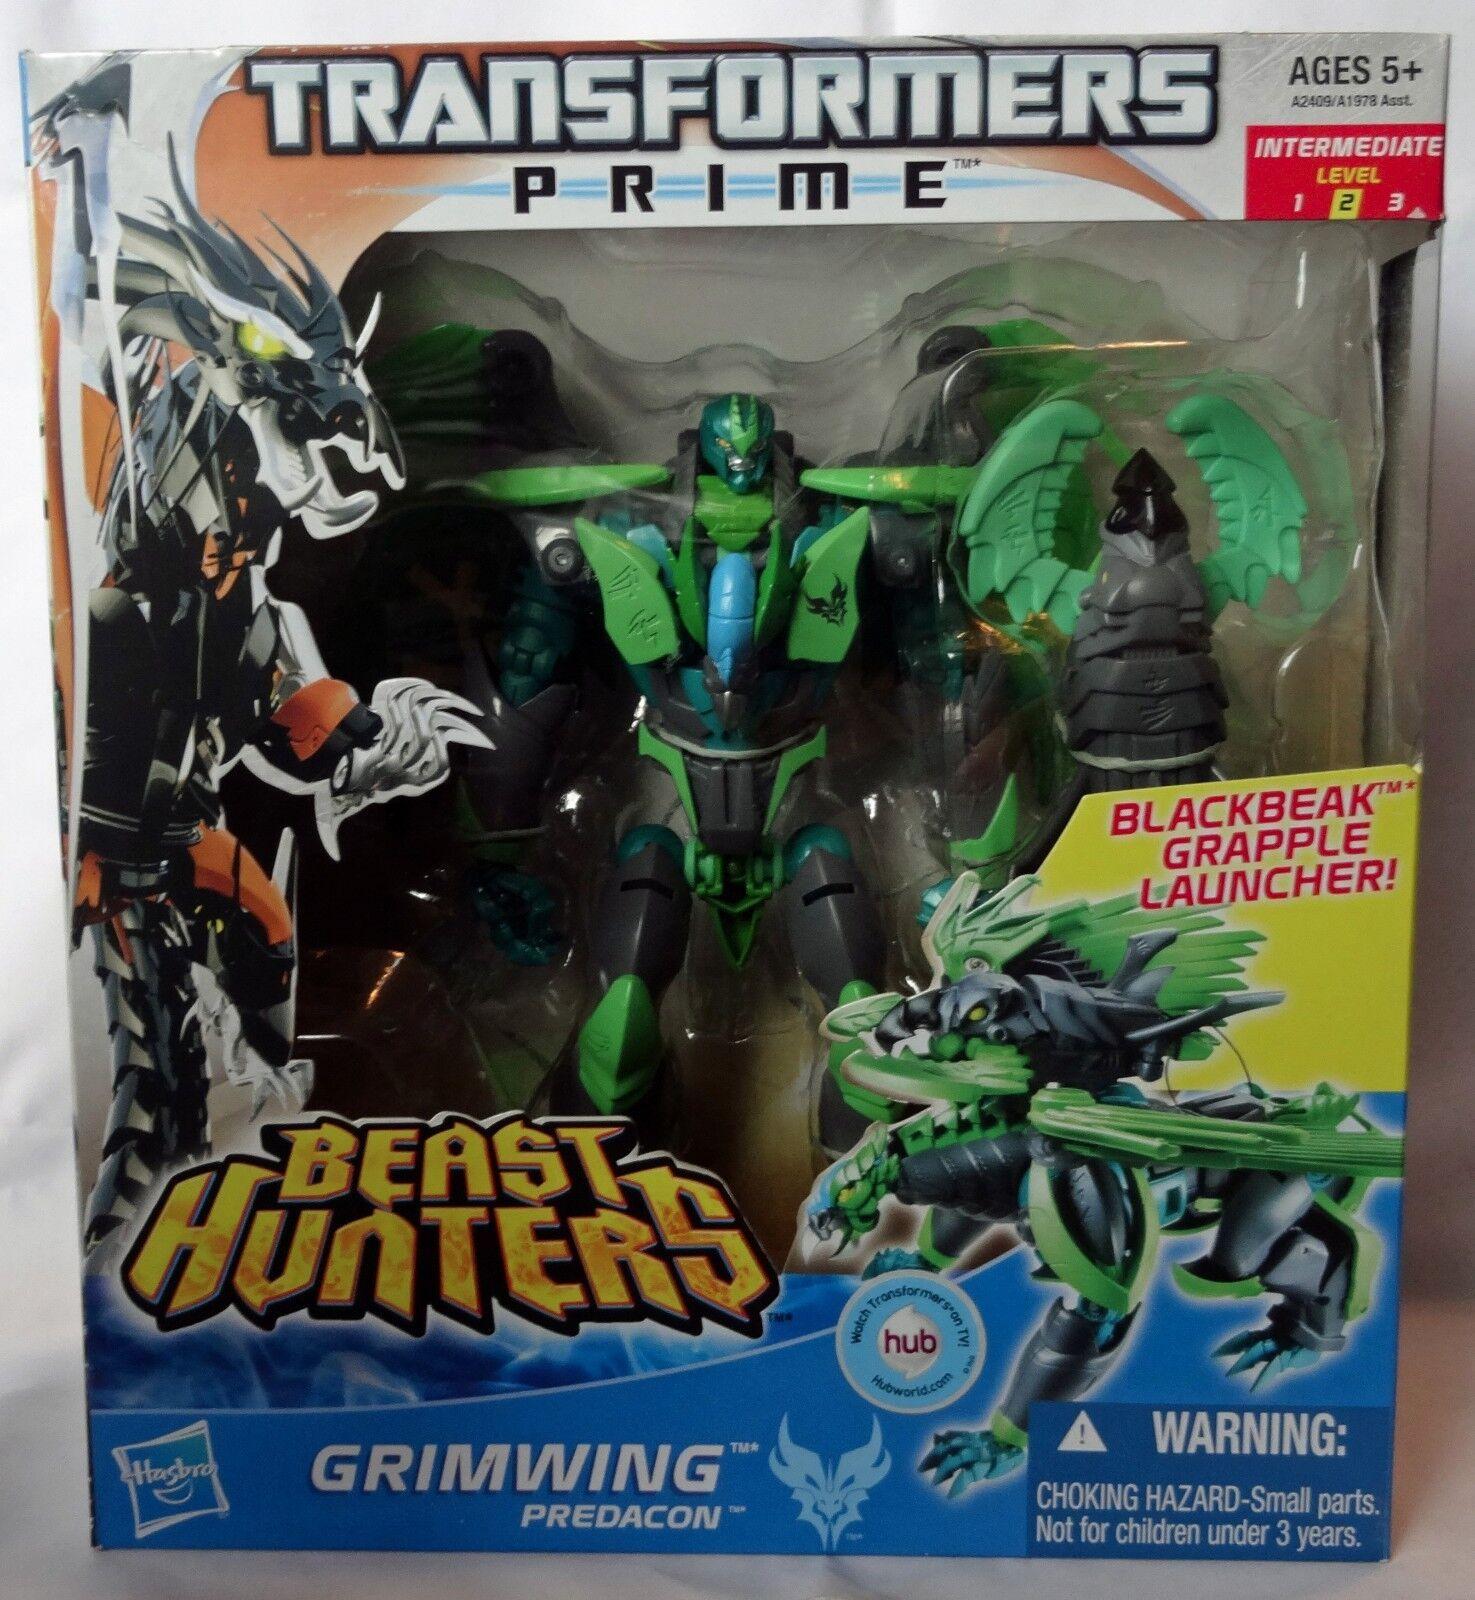 GRIMWING Transformers Prime Beast Hunters Voyager Class Beast Wars Predacon MISB